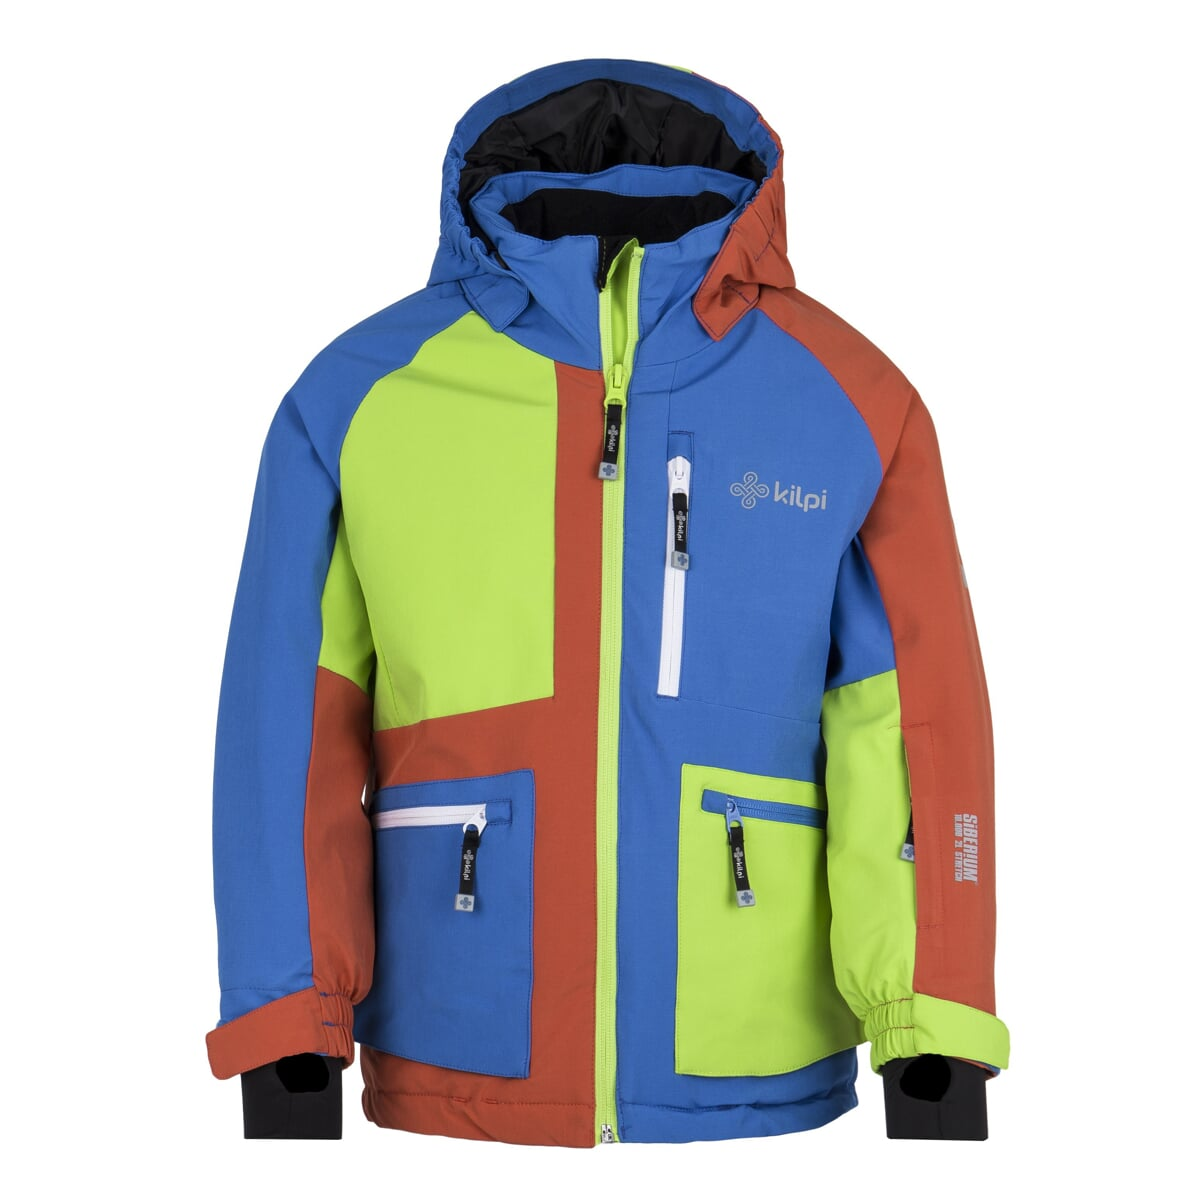 Chlapčenská zimná bunda Kilpi JACKYL-JB  aadf29f85be